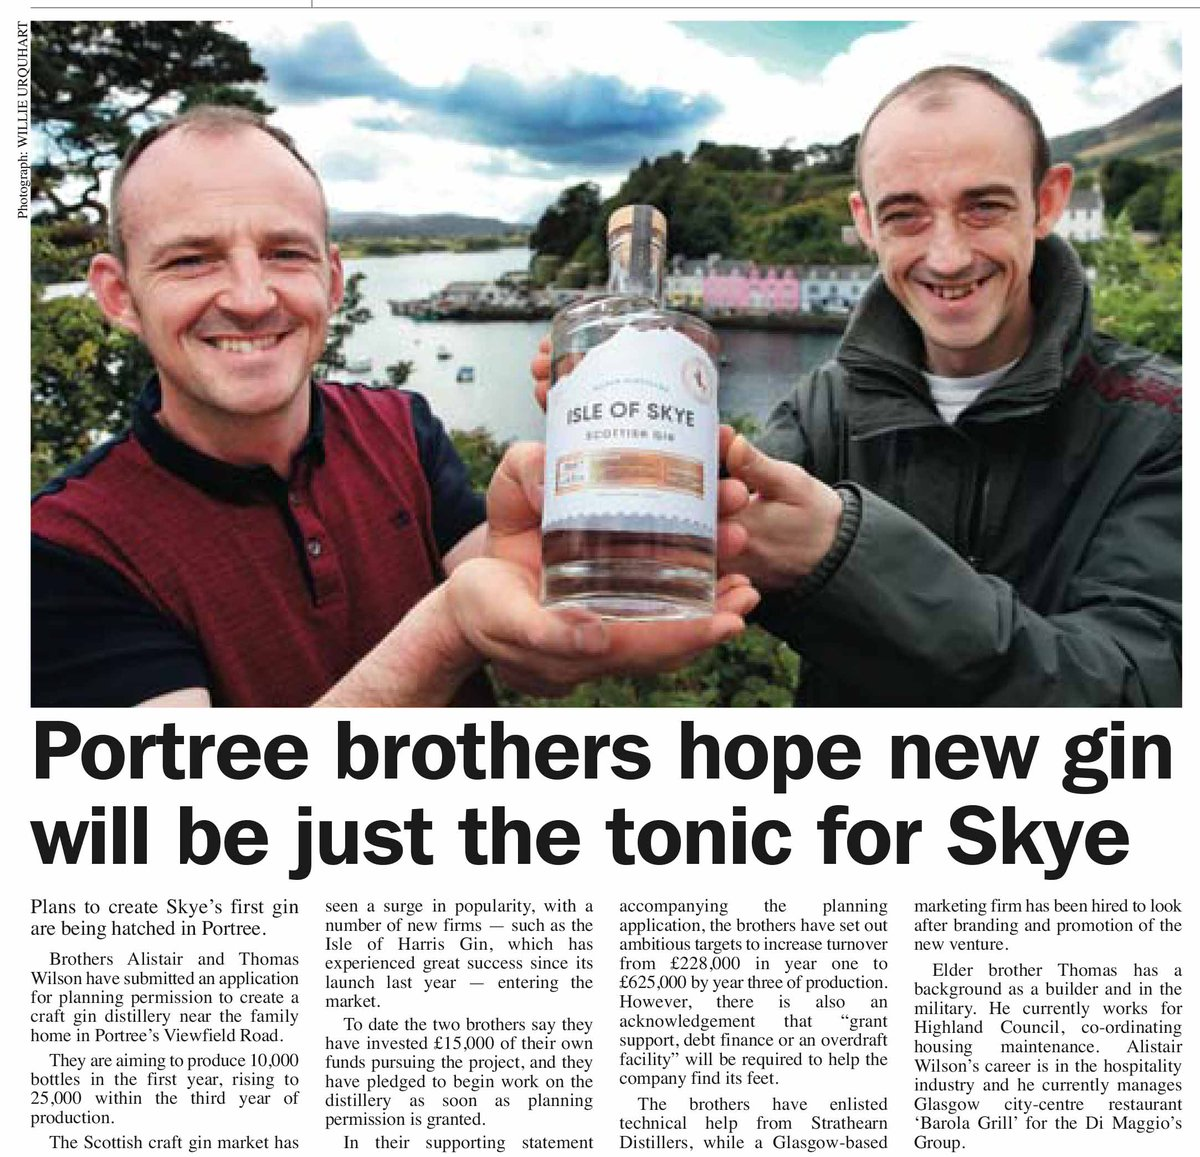 Isle of Skye Distil on Twitter: